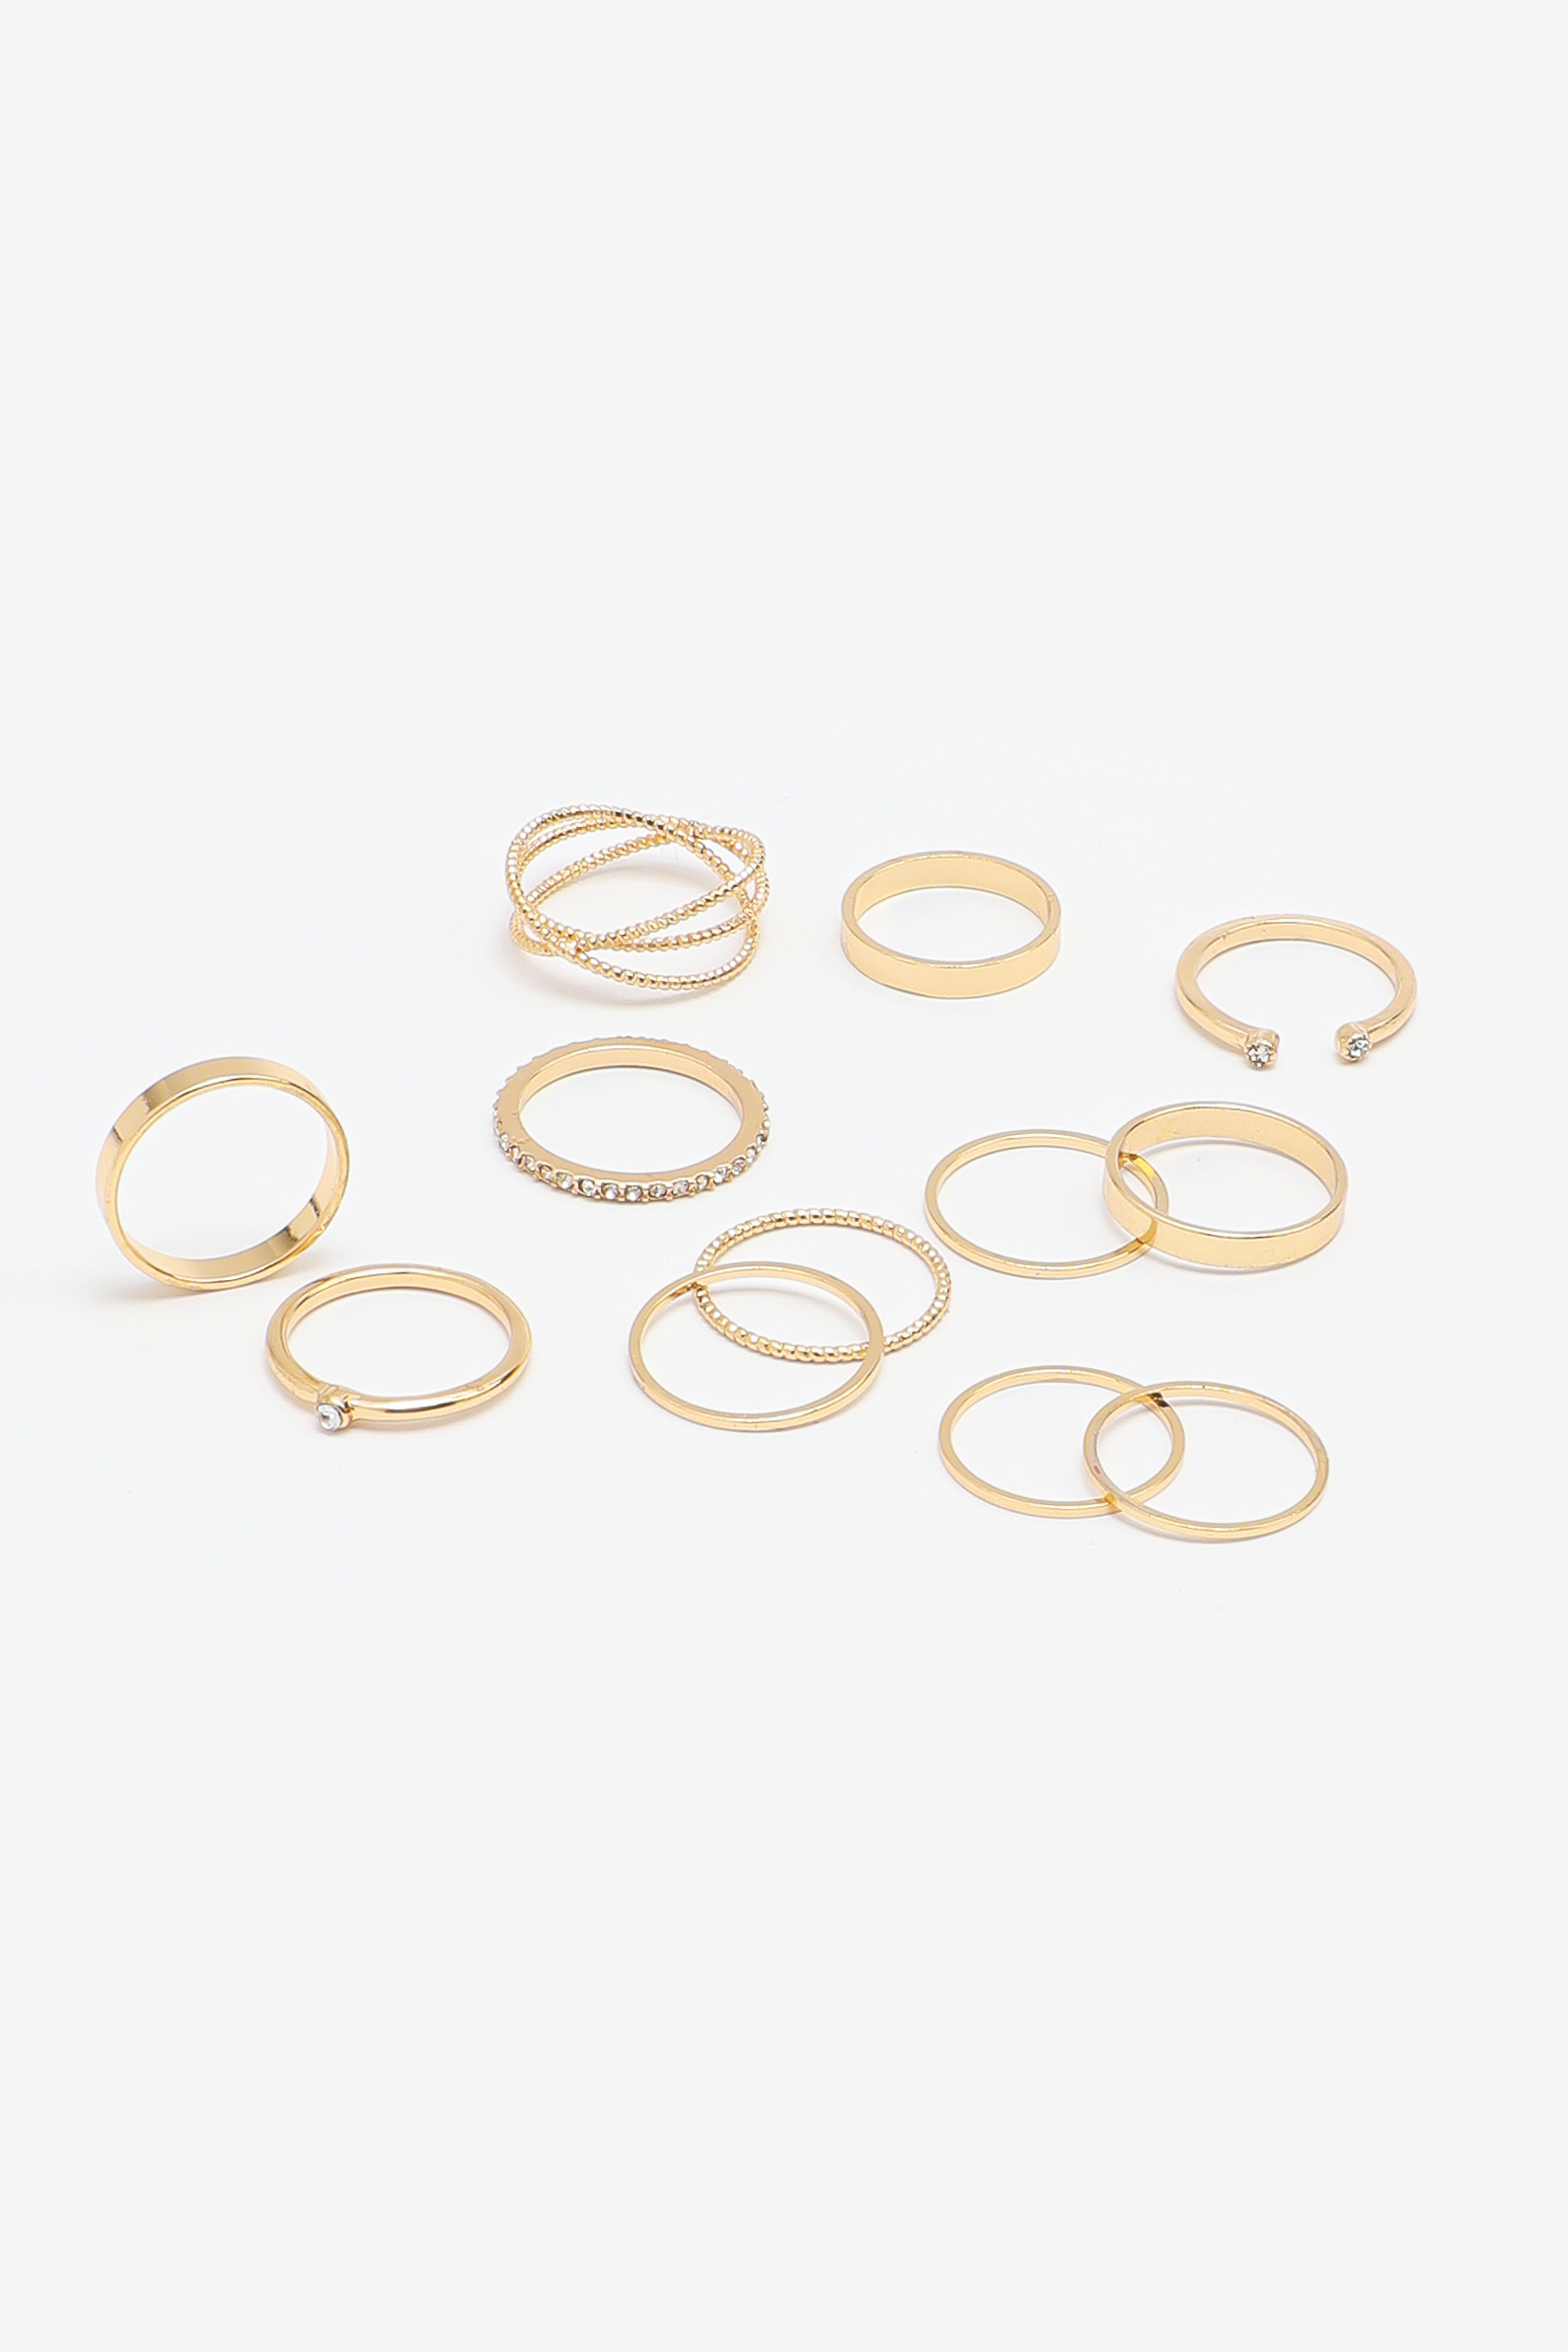 8-Pack Gold Rings